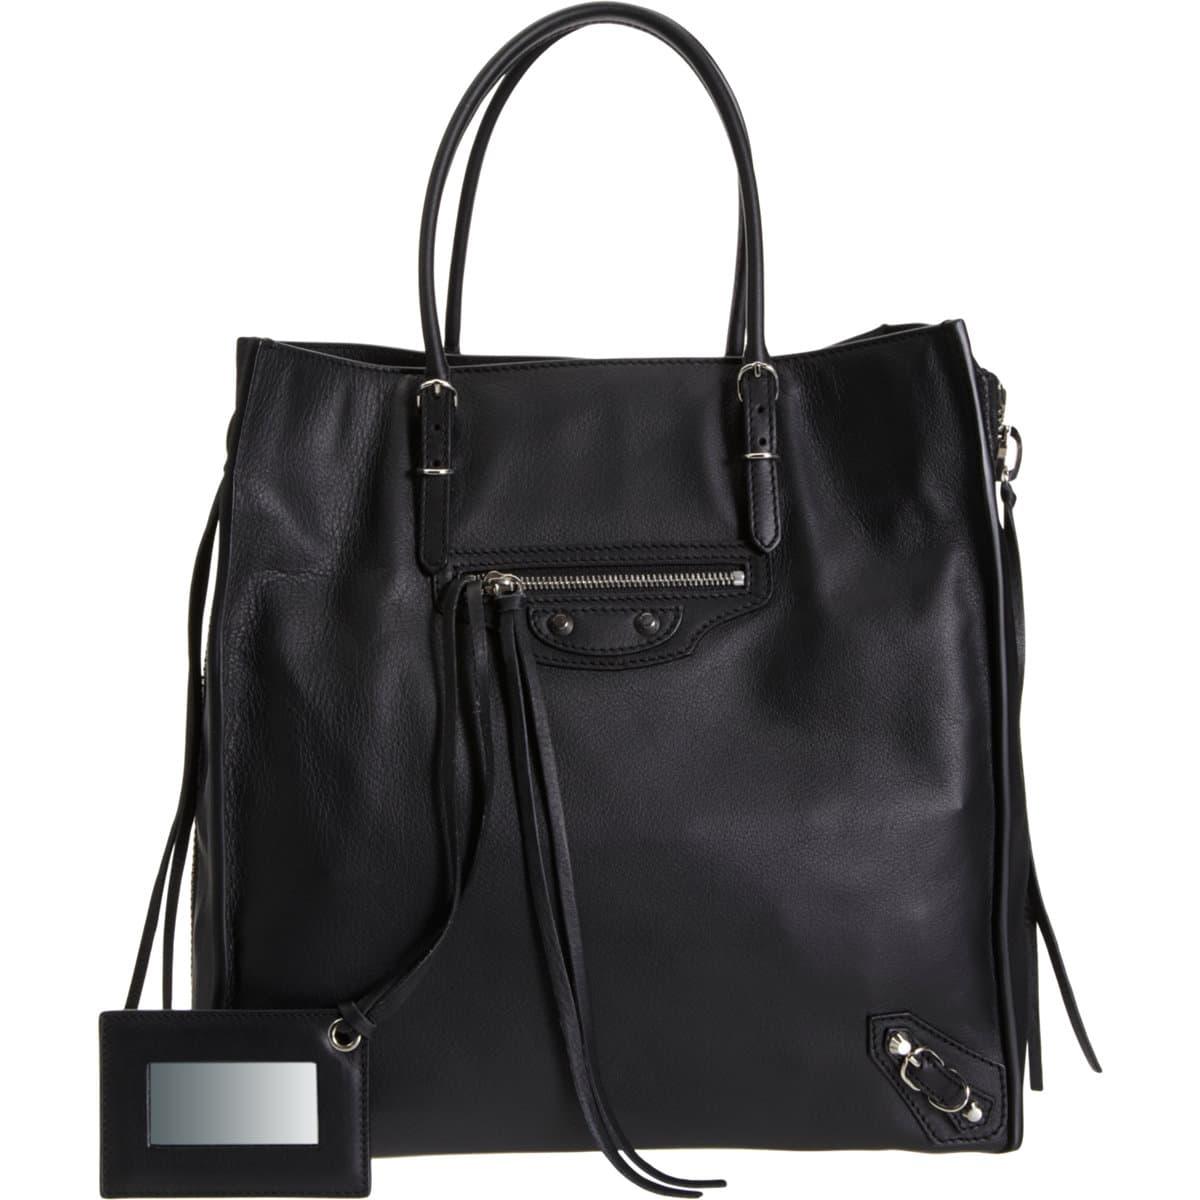 Balenciaga Papier Belt Bag